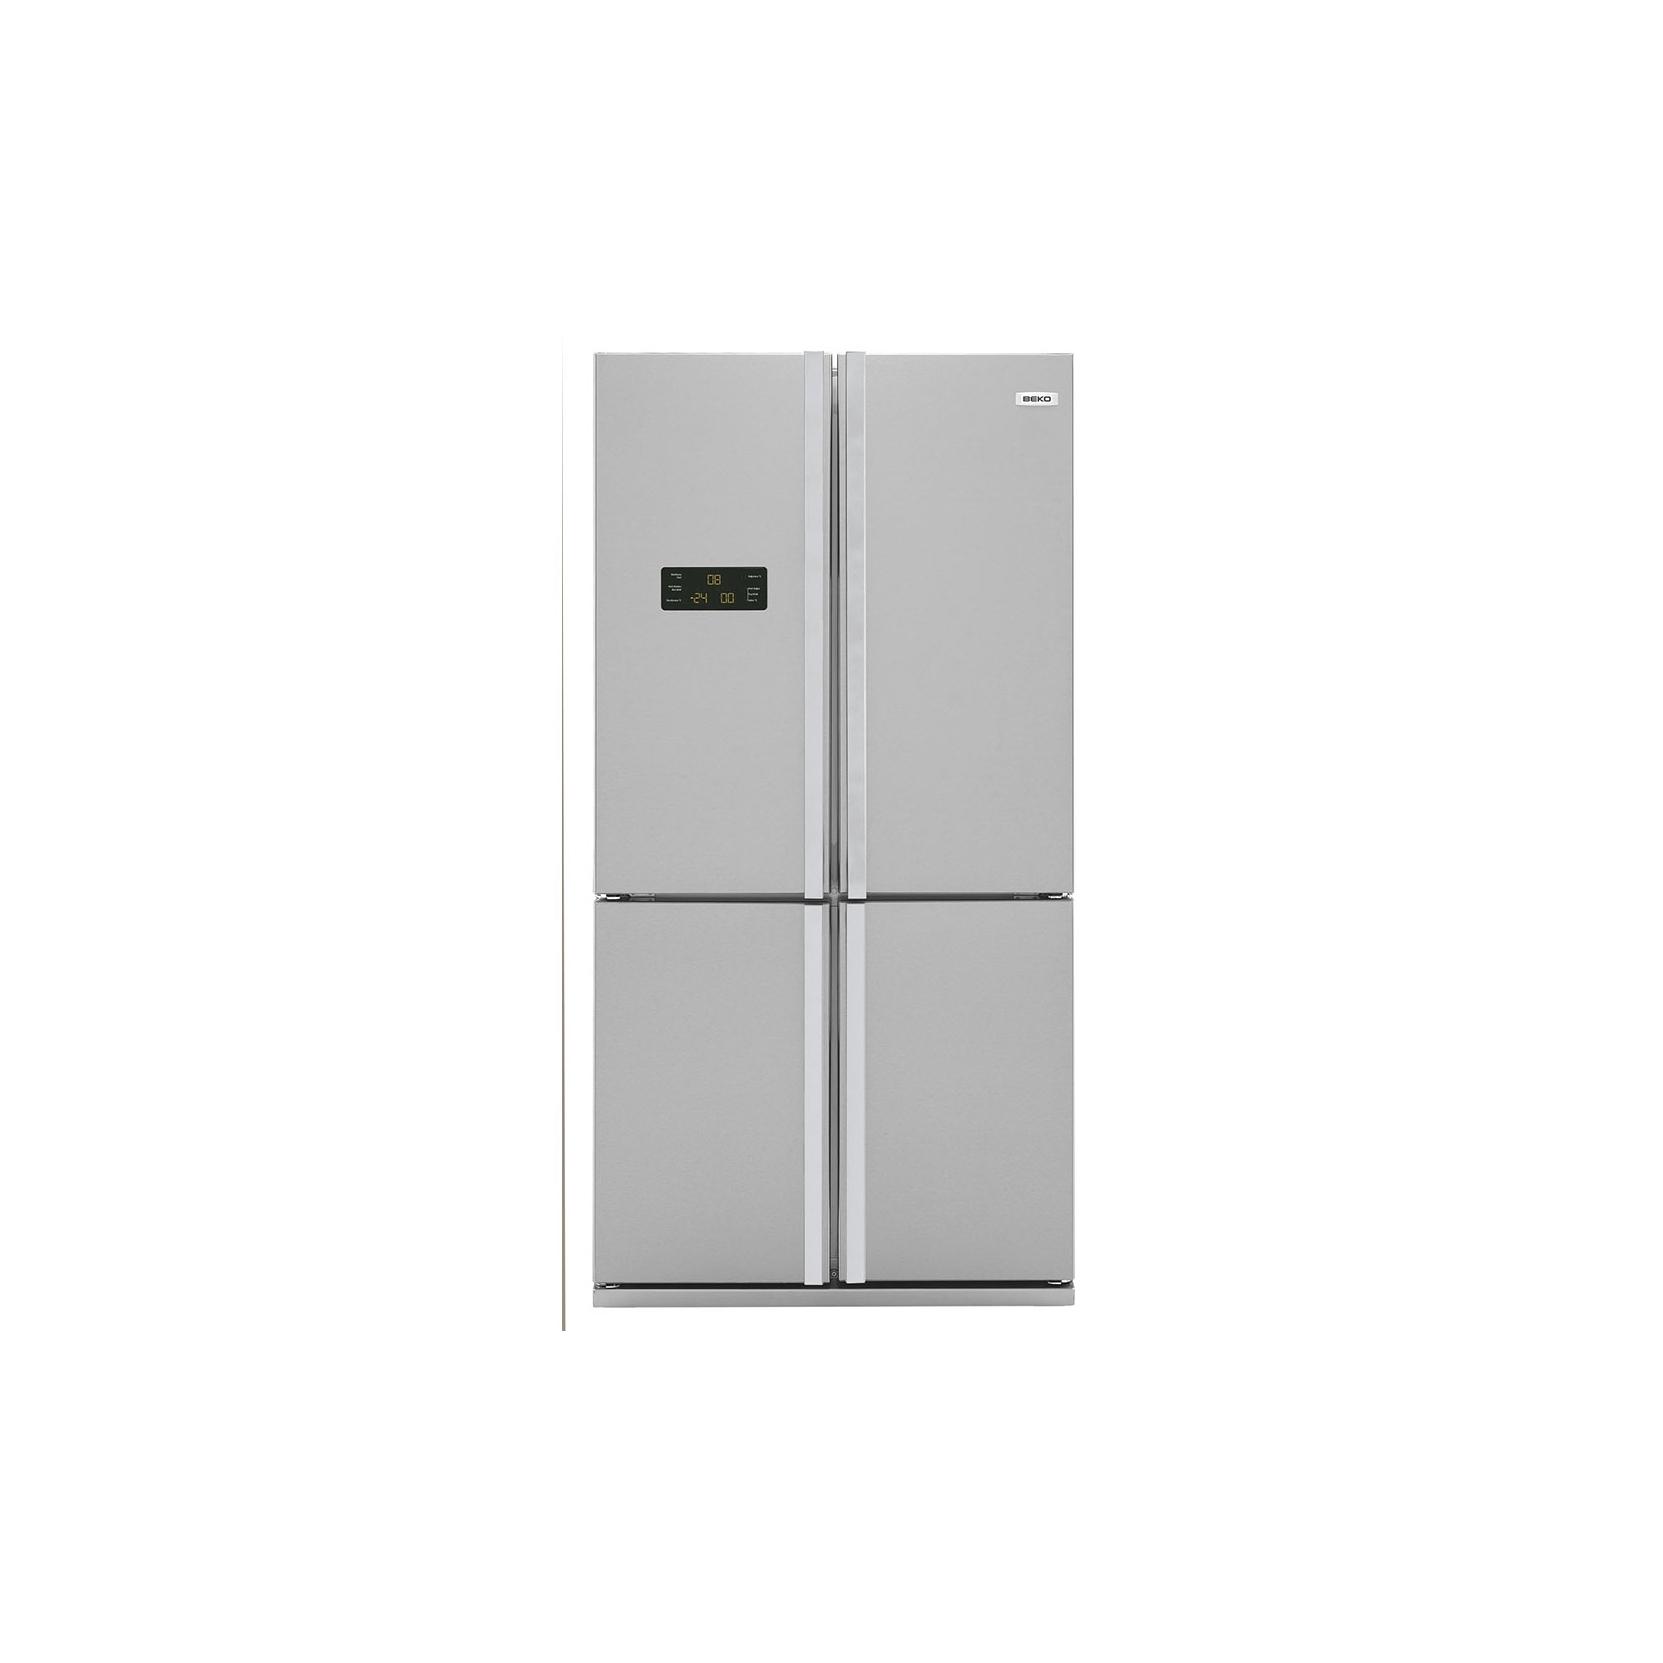 Beko gne114612x frigorifero 4 porte total no frost a for Frigorifero side by side 4 porte